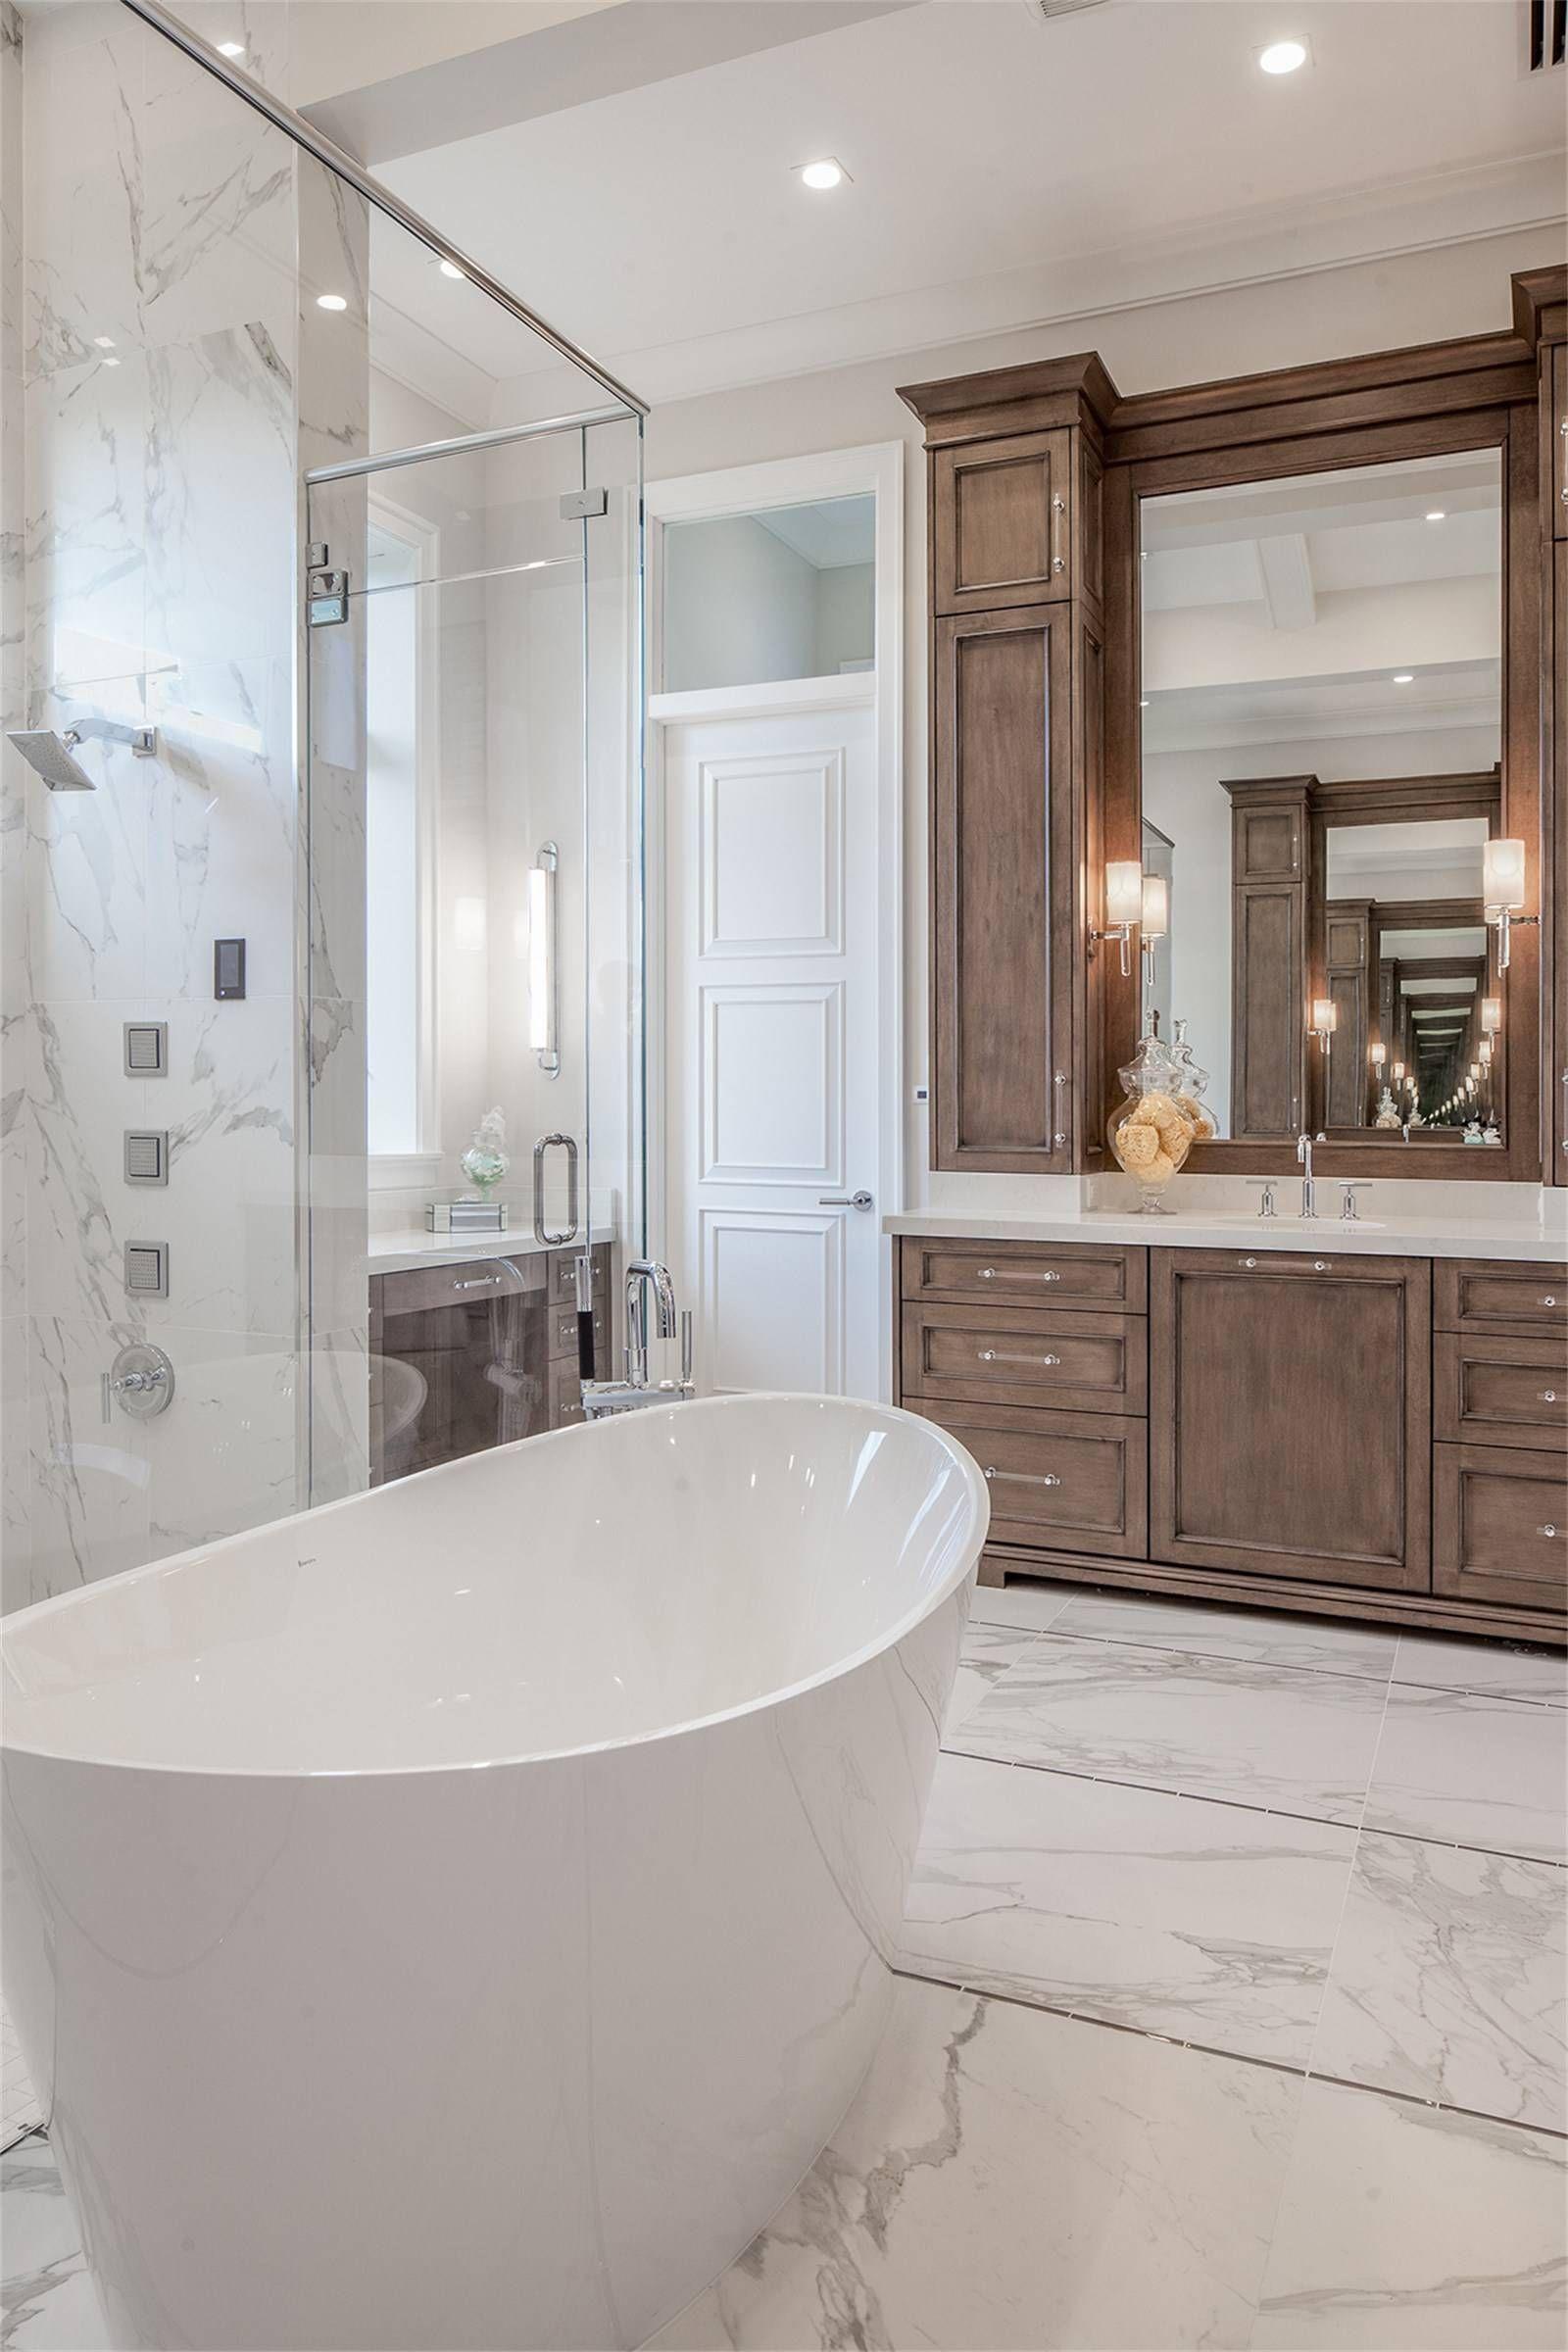 727 Buttonbush Lane Naples Fl 34108 Master Bathroom With His And Hers Vanities His And Hers Water Bathroom Images Bathroom Interior Design Guest Bathrooms [ 2400 x 1600 Pixel ]